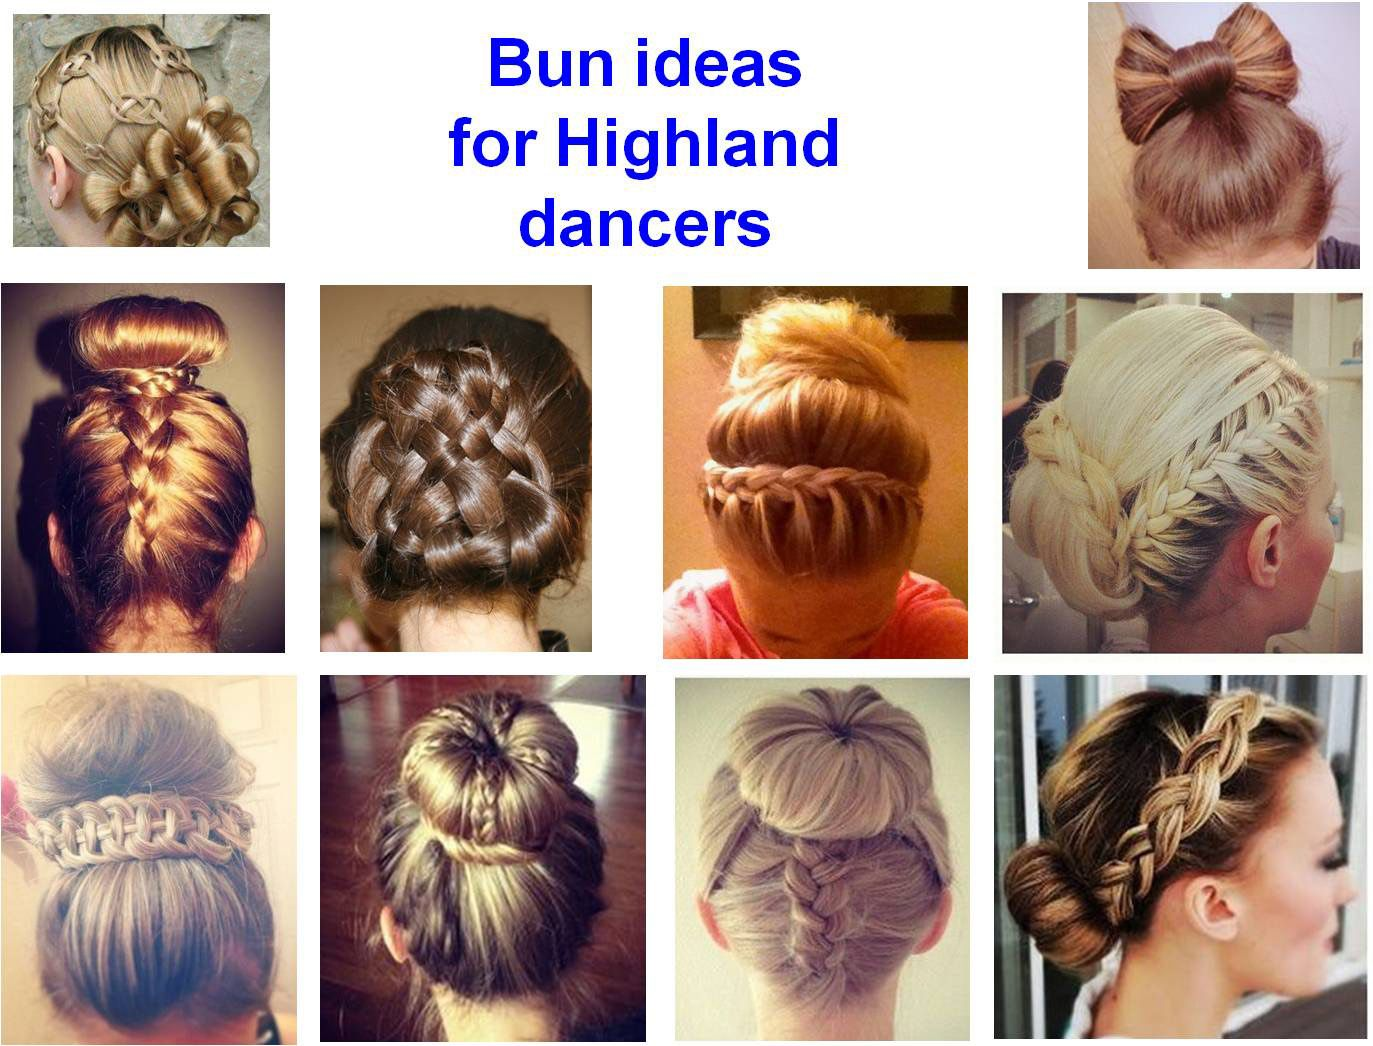 Bun Hairstyle Ideas For Highland Dancers Dance Hairstyles Dancer Hairstyles Dance Competition Hair